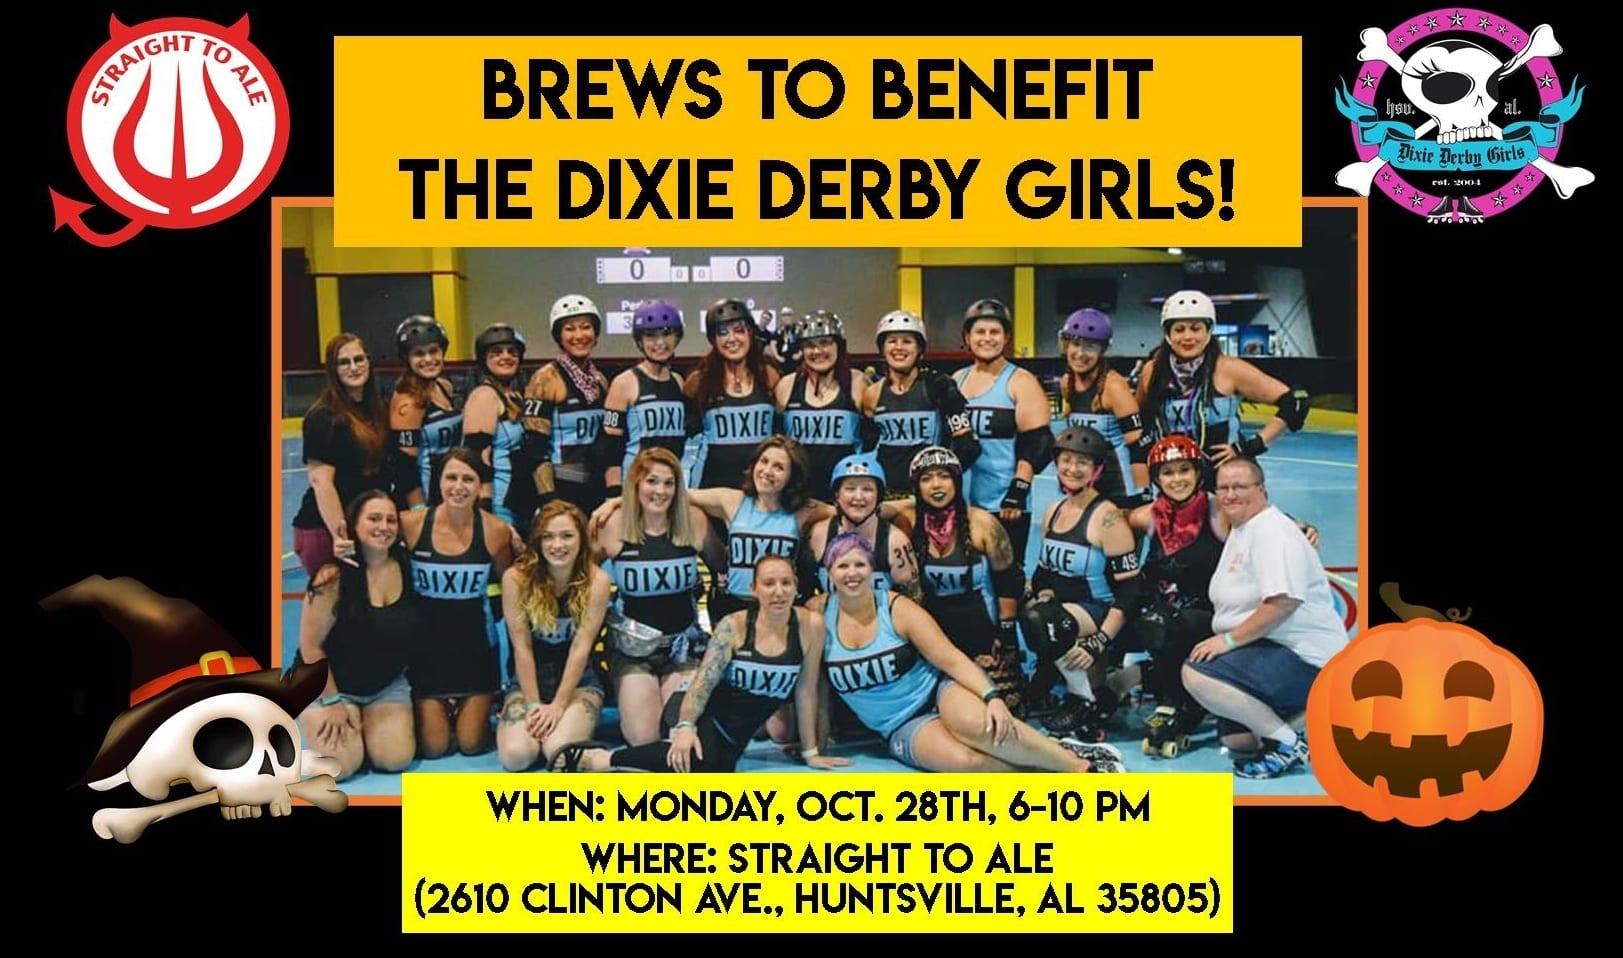 Brews to Benefit the Dixie Derby Girls!